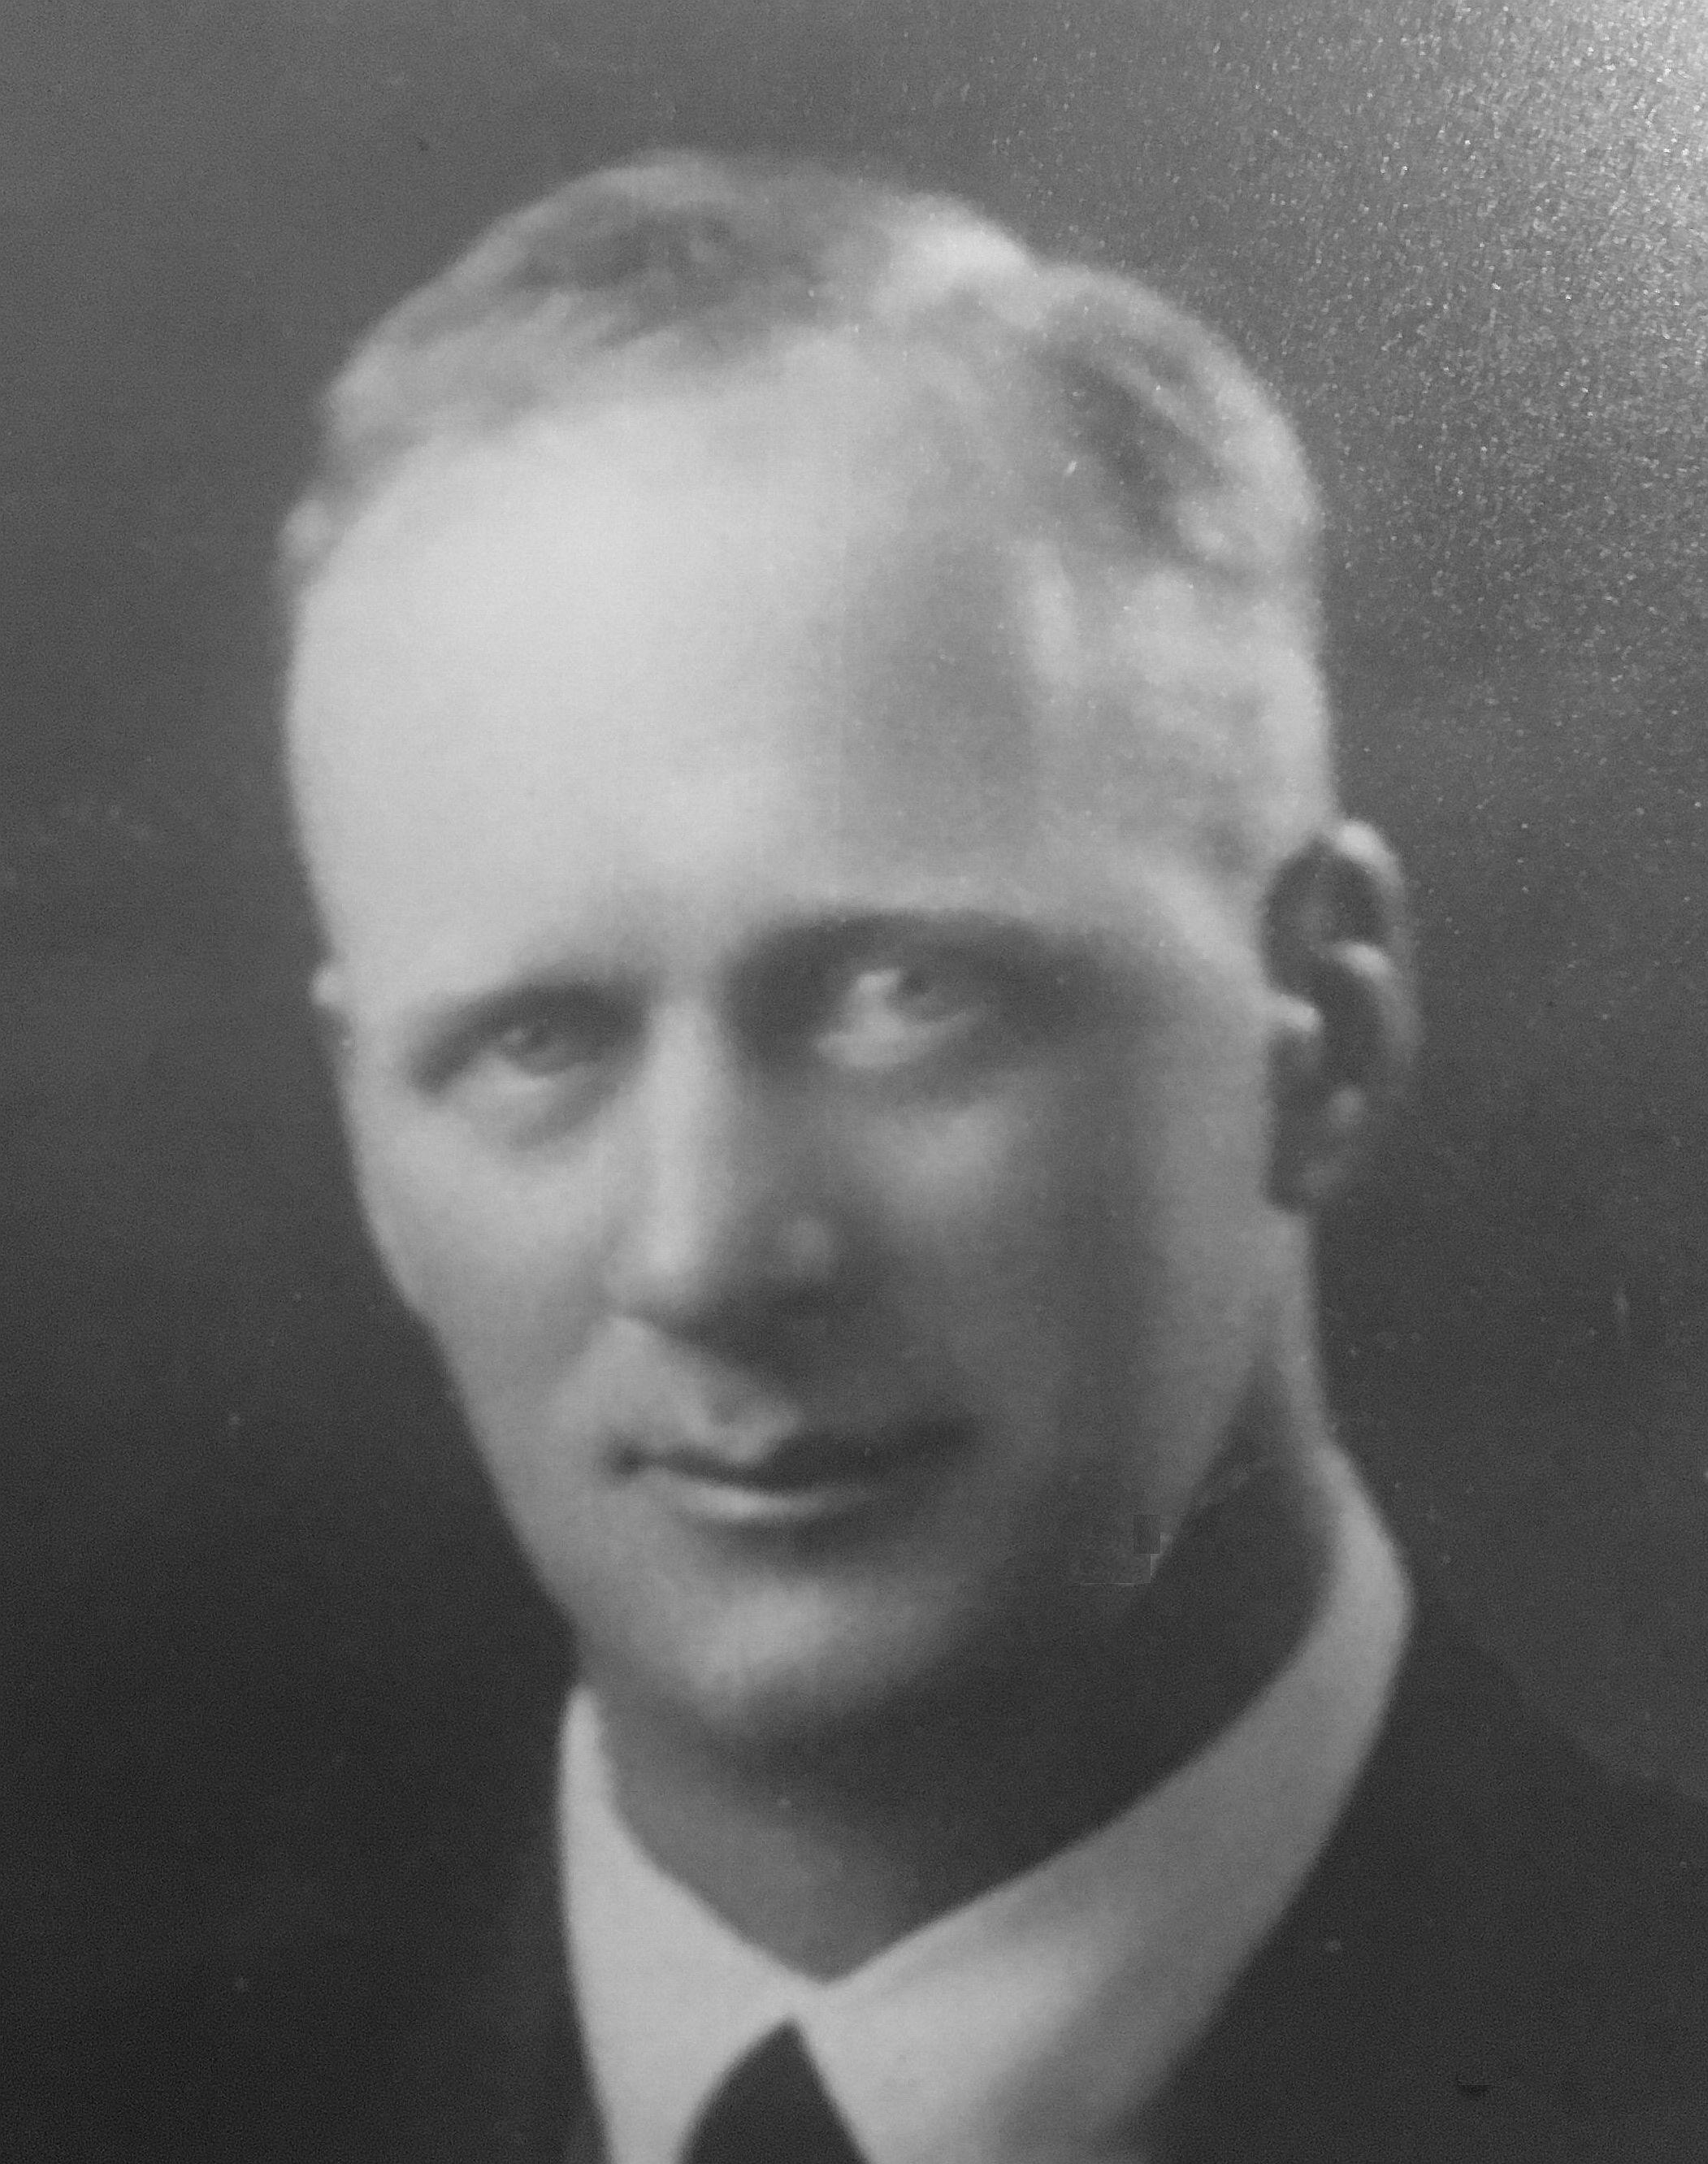 Barclay, William Douglas